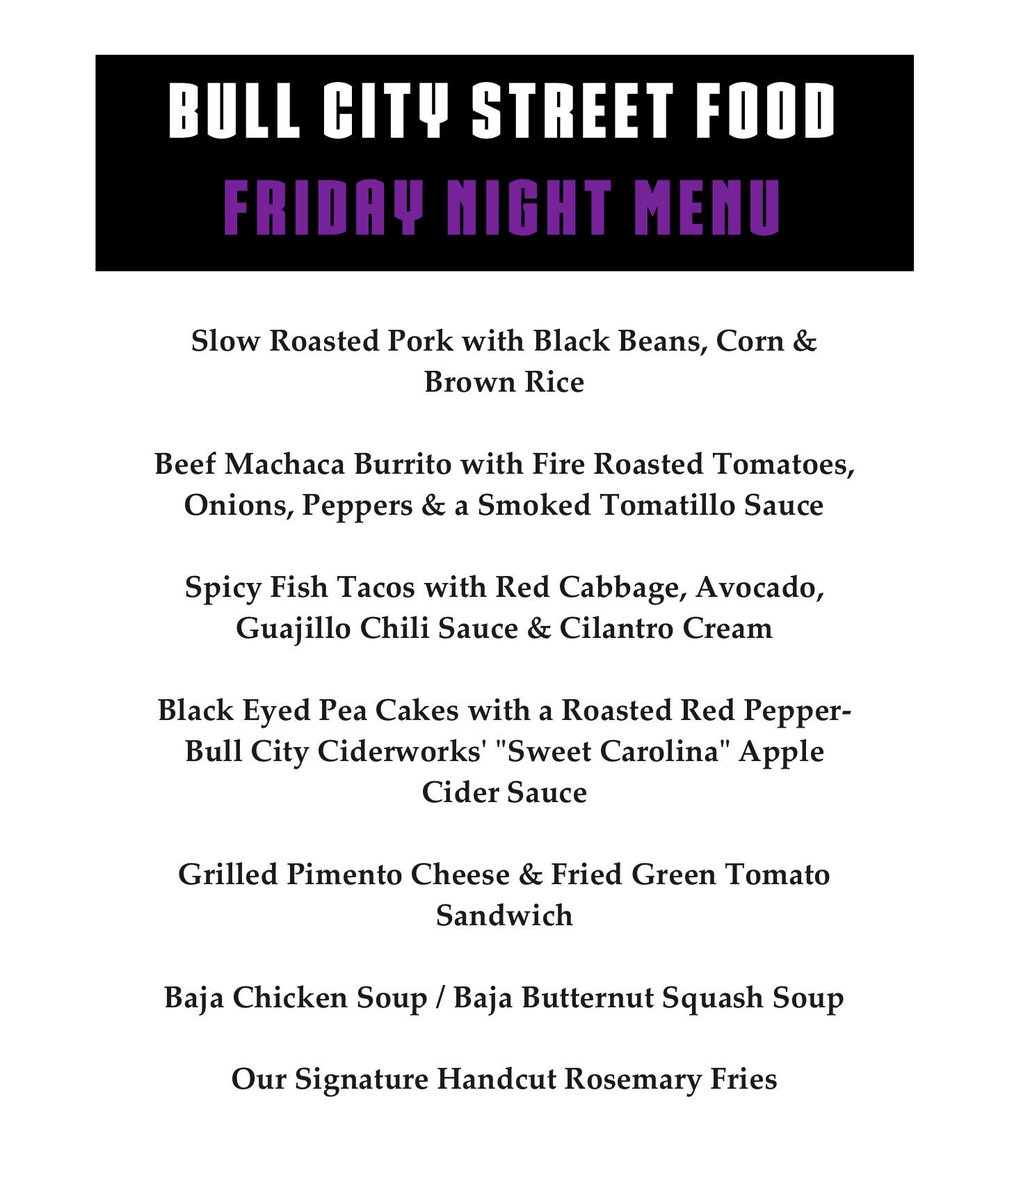 faf3a7a3e Bull City Ciderworks on Twitter: